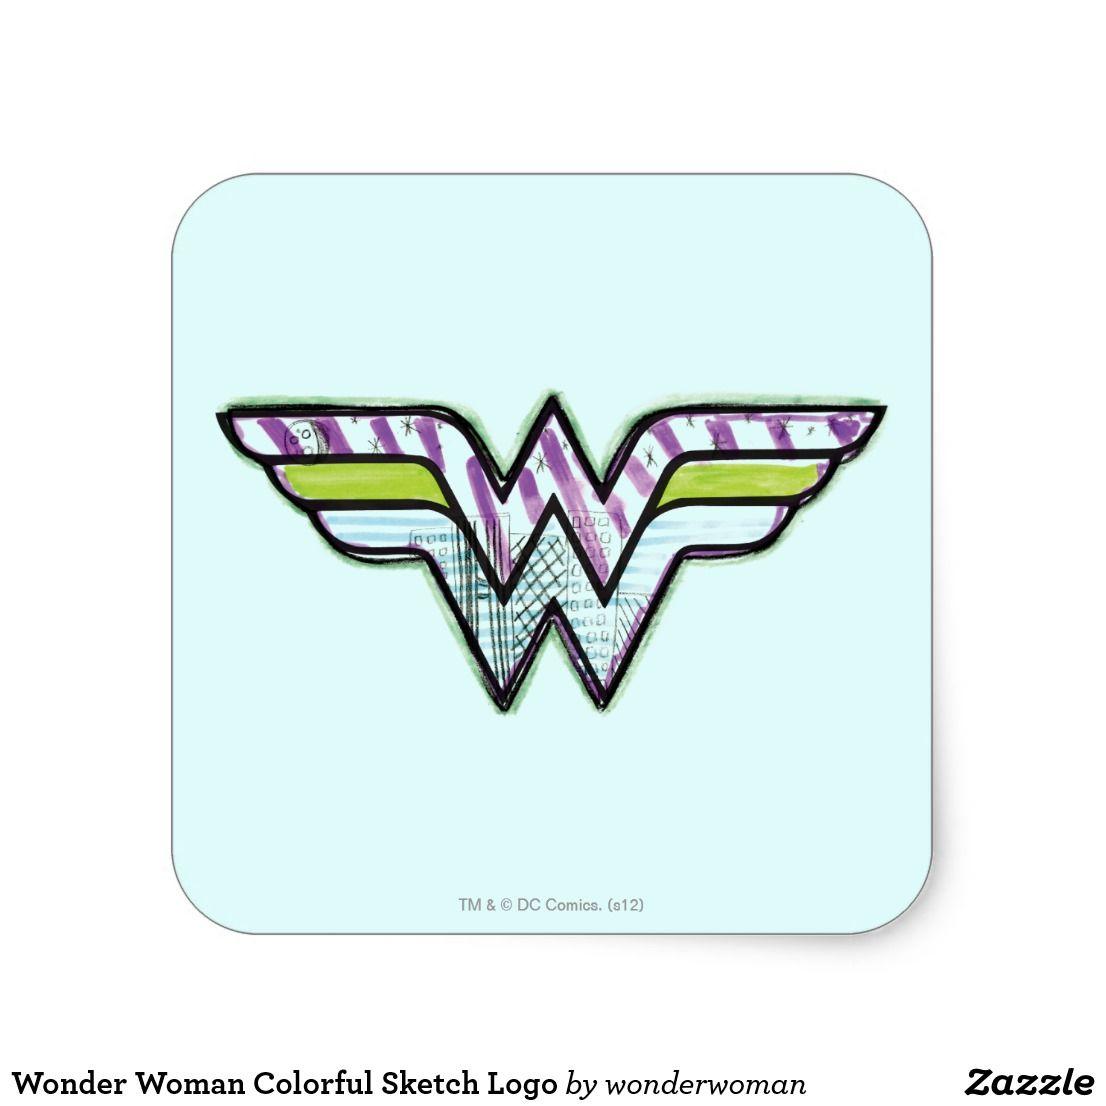 Wonder Woman Colorful Sketch Logo Square Sticker Zazzle Com Custom Stickers Create Custom Stickers Wonder Woman [ 1106 x 1106 Pixel ]